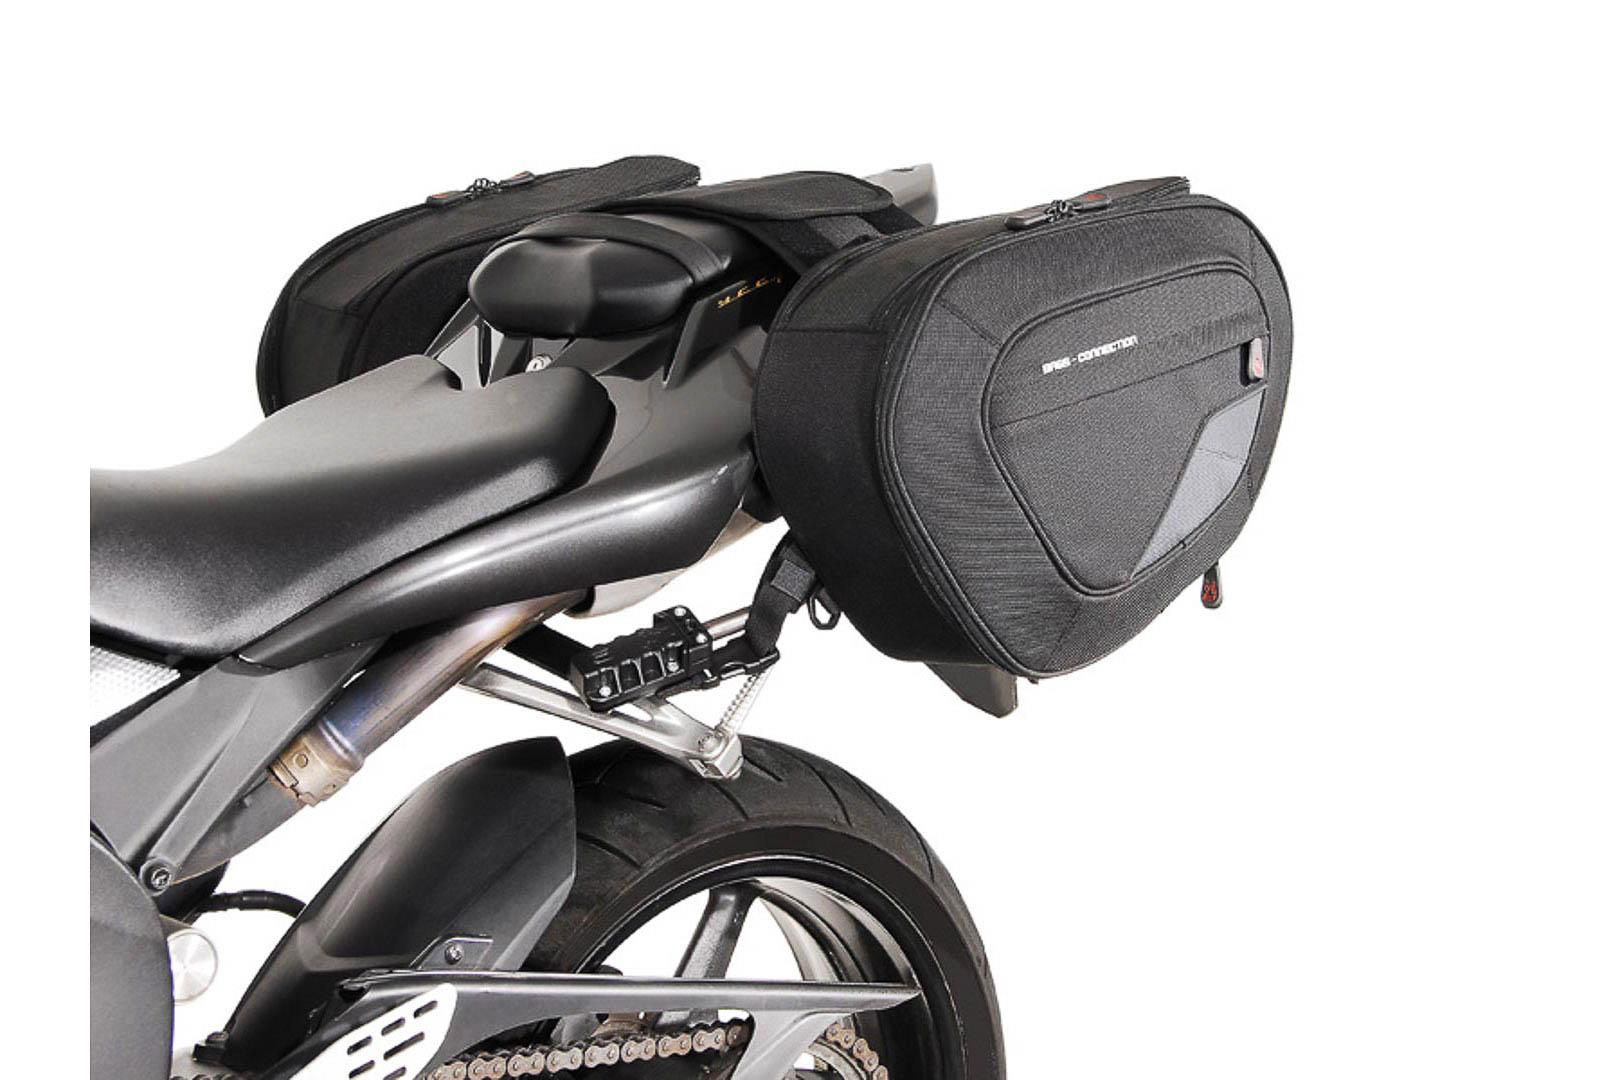 Blaze sivulaukkusarja, Yamaha YZF-R1 07-08